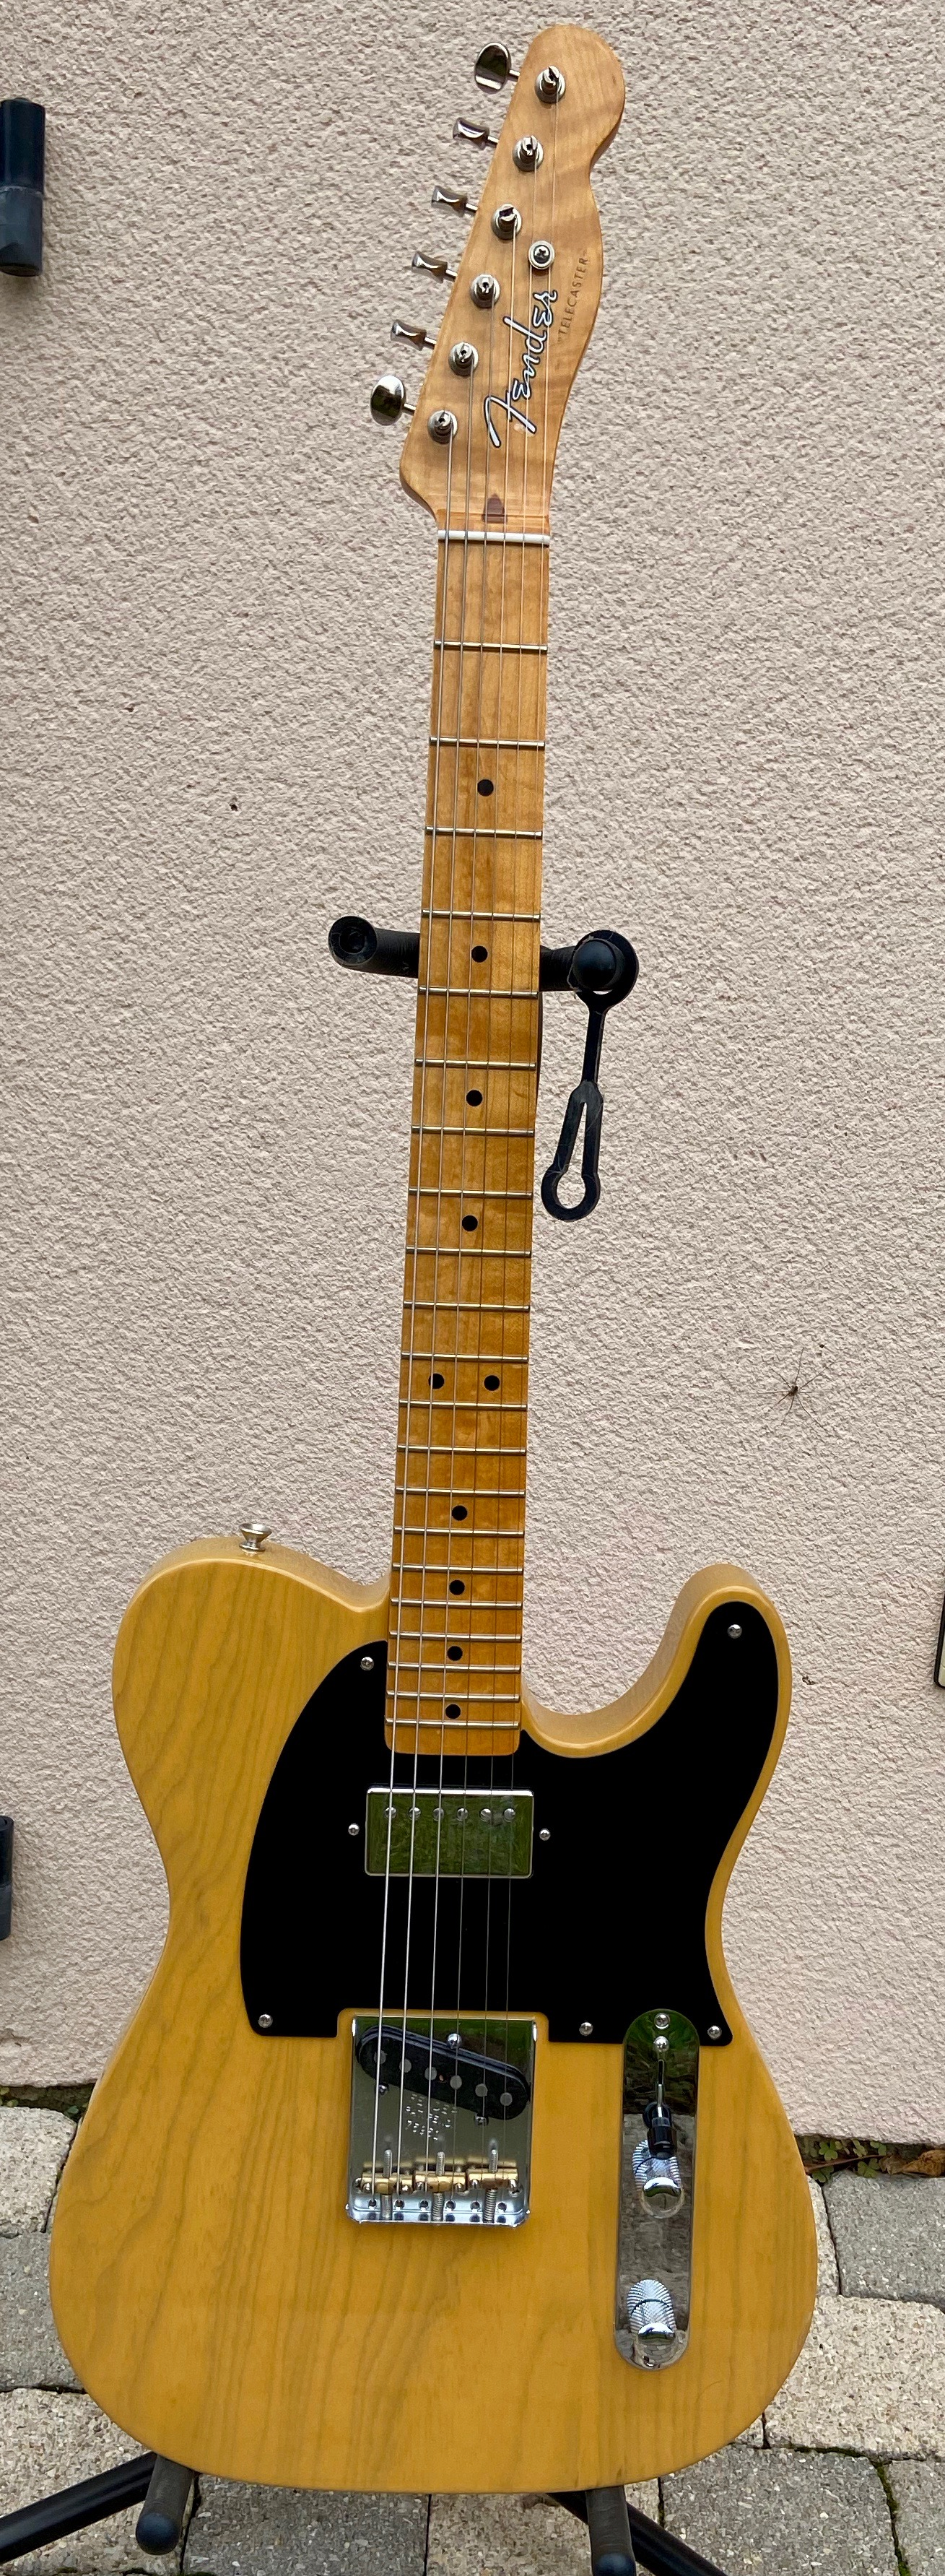 hipótesis Paloma María  Tele-Bration Vintage Hot Rod '52 Telecaster Fender - Audiofanzine